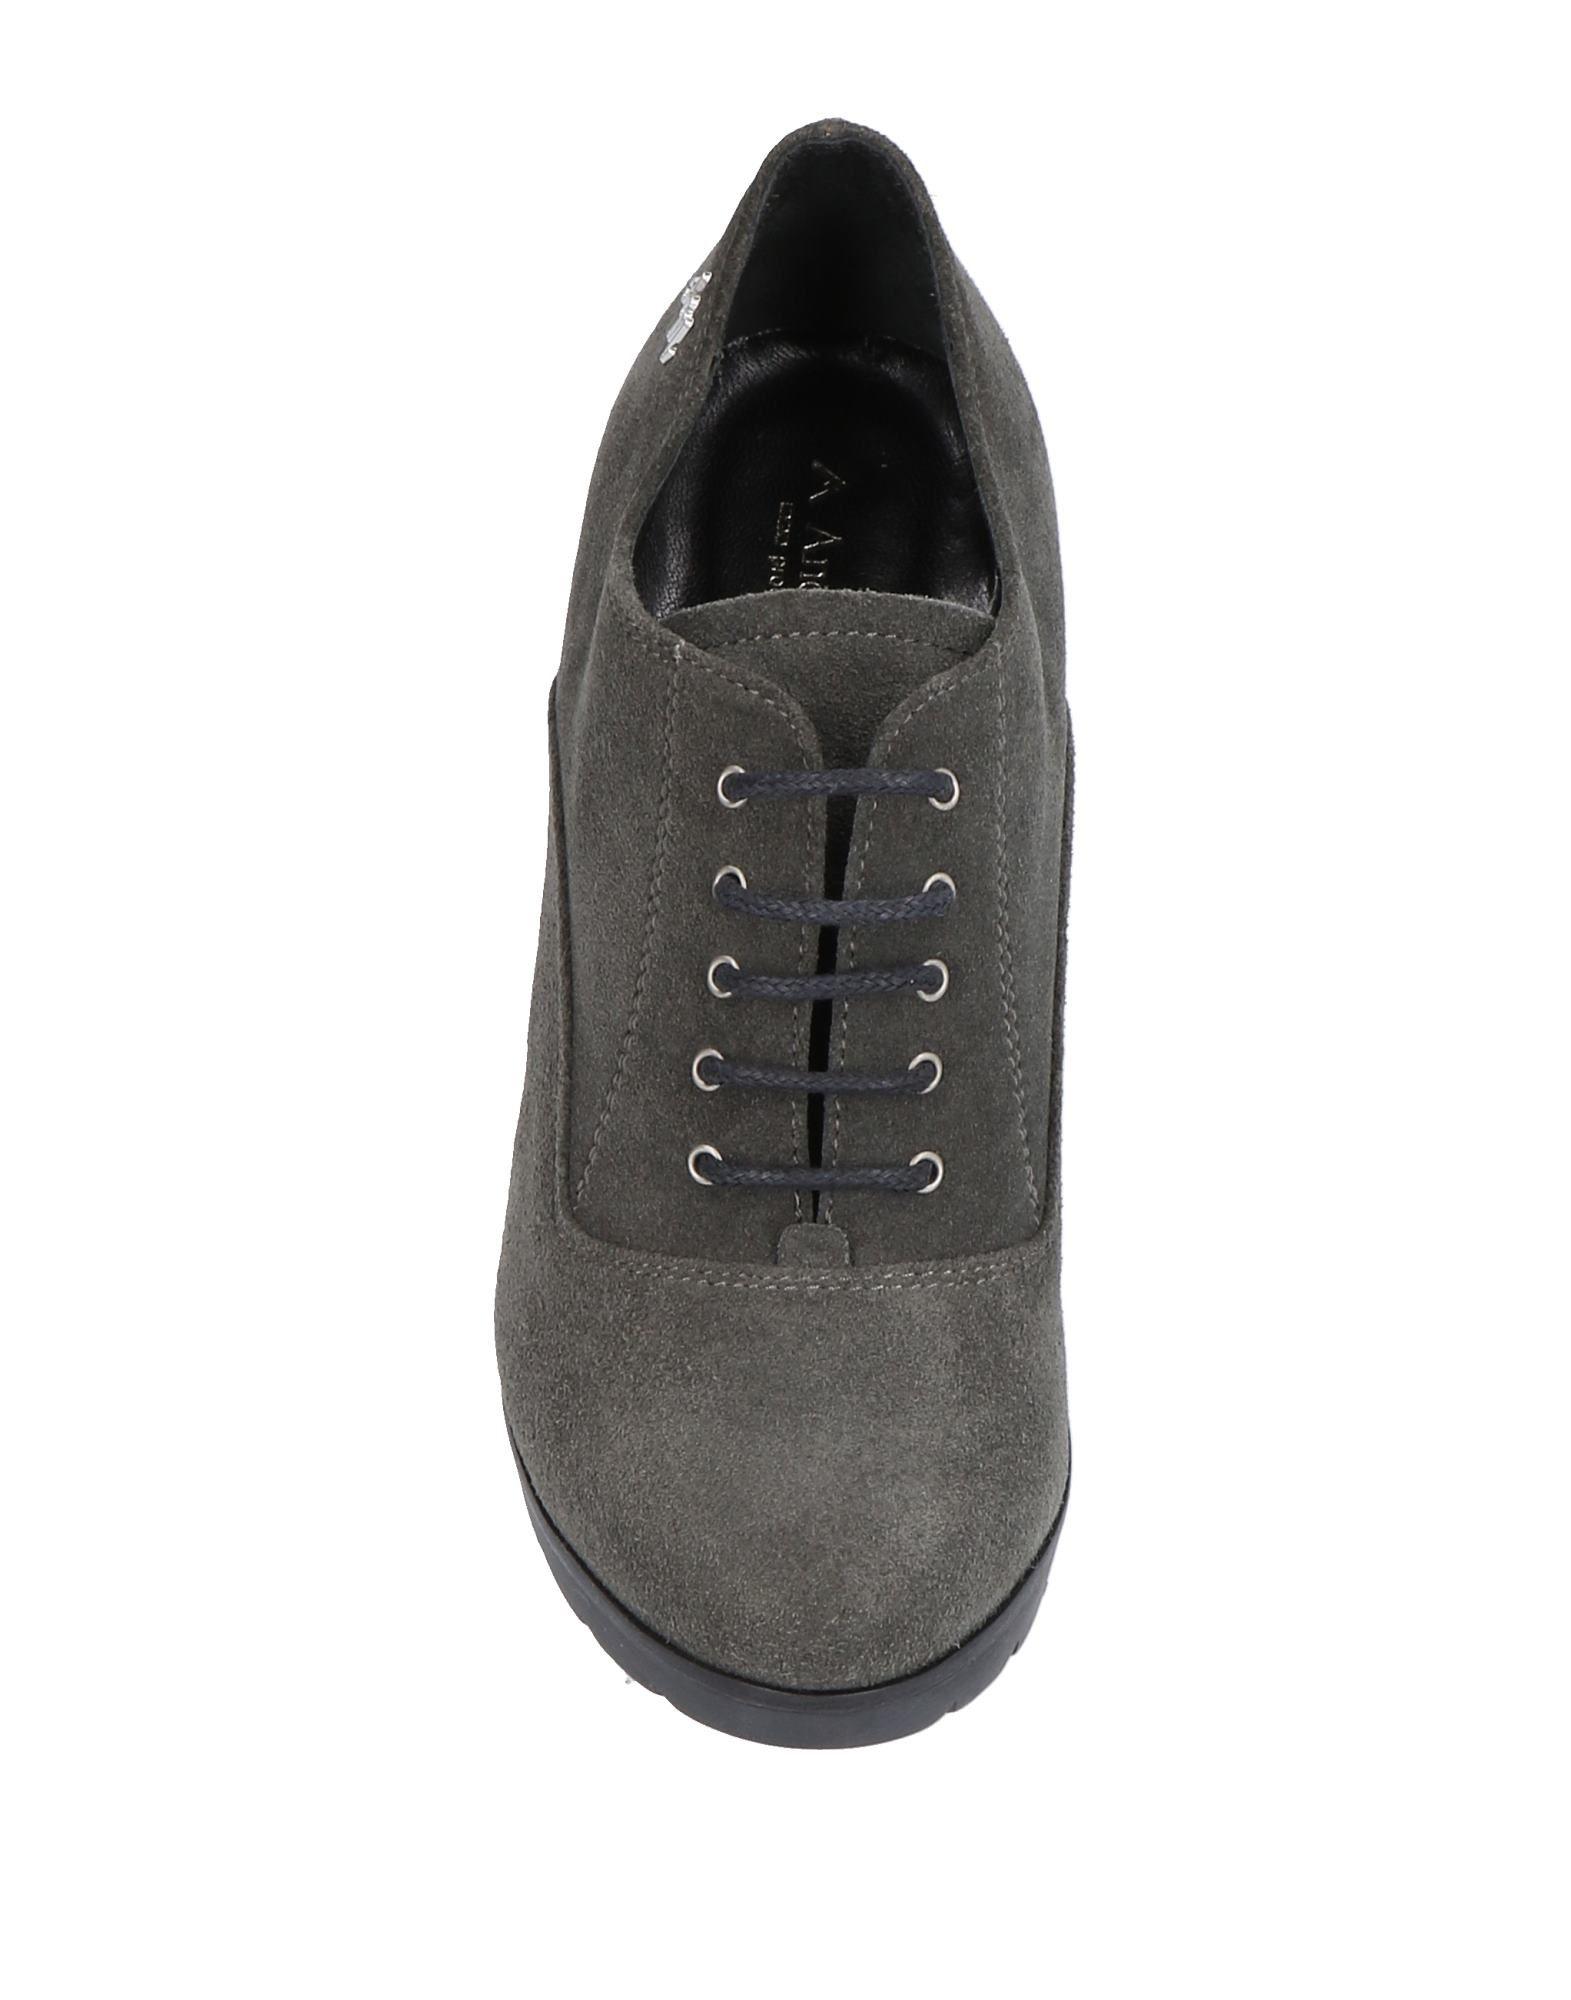 Gut um Morelli billige Schuhe zu tragenAndrea Morelli um Schnürschuhe Damen  11486968HU 74162d